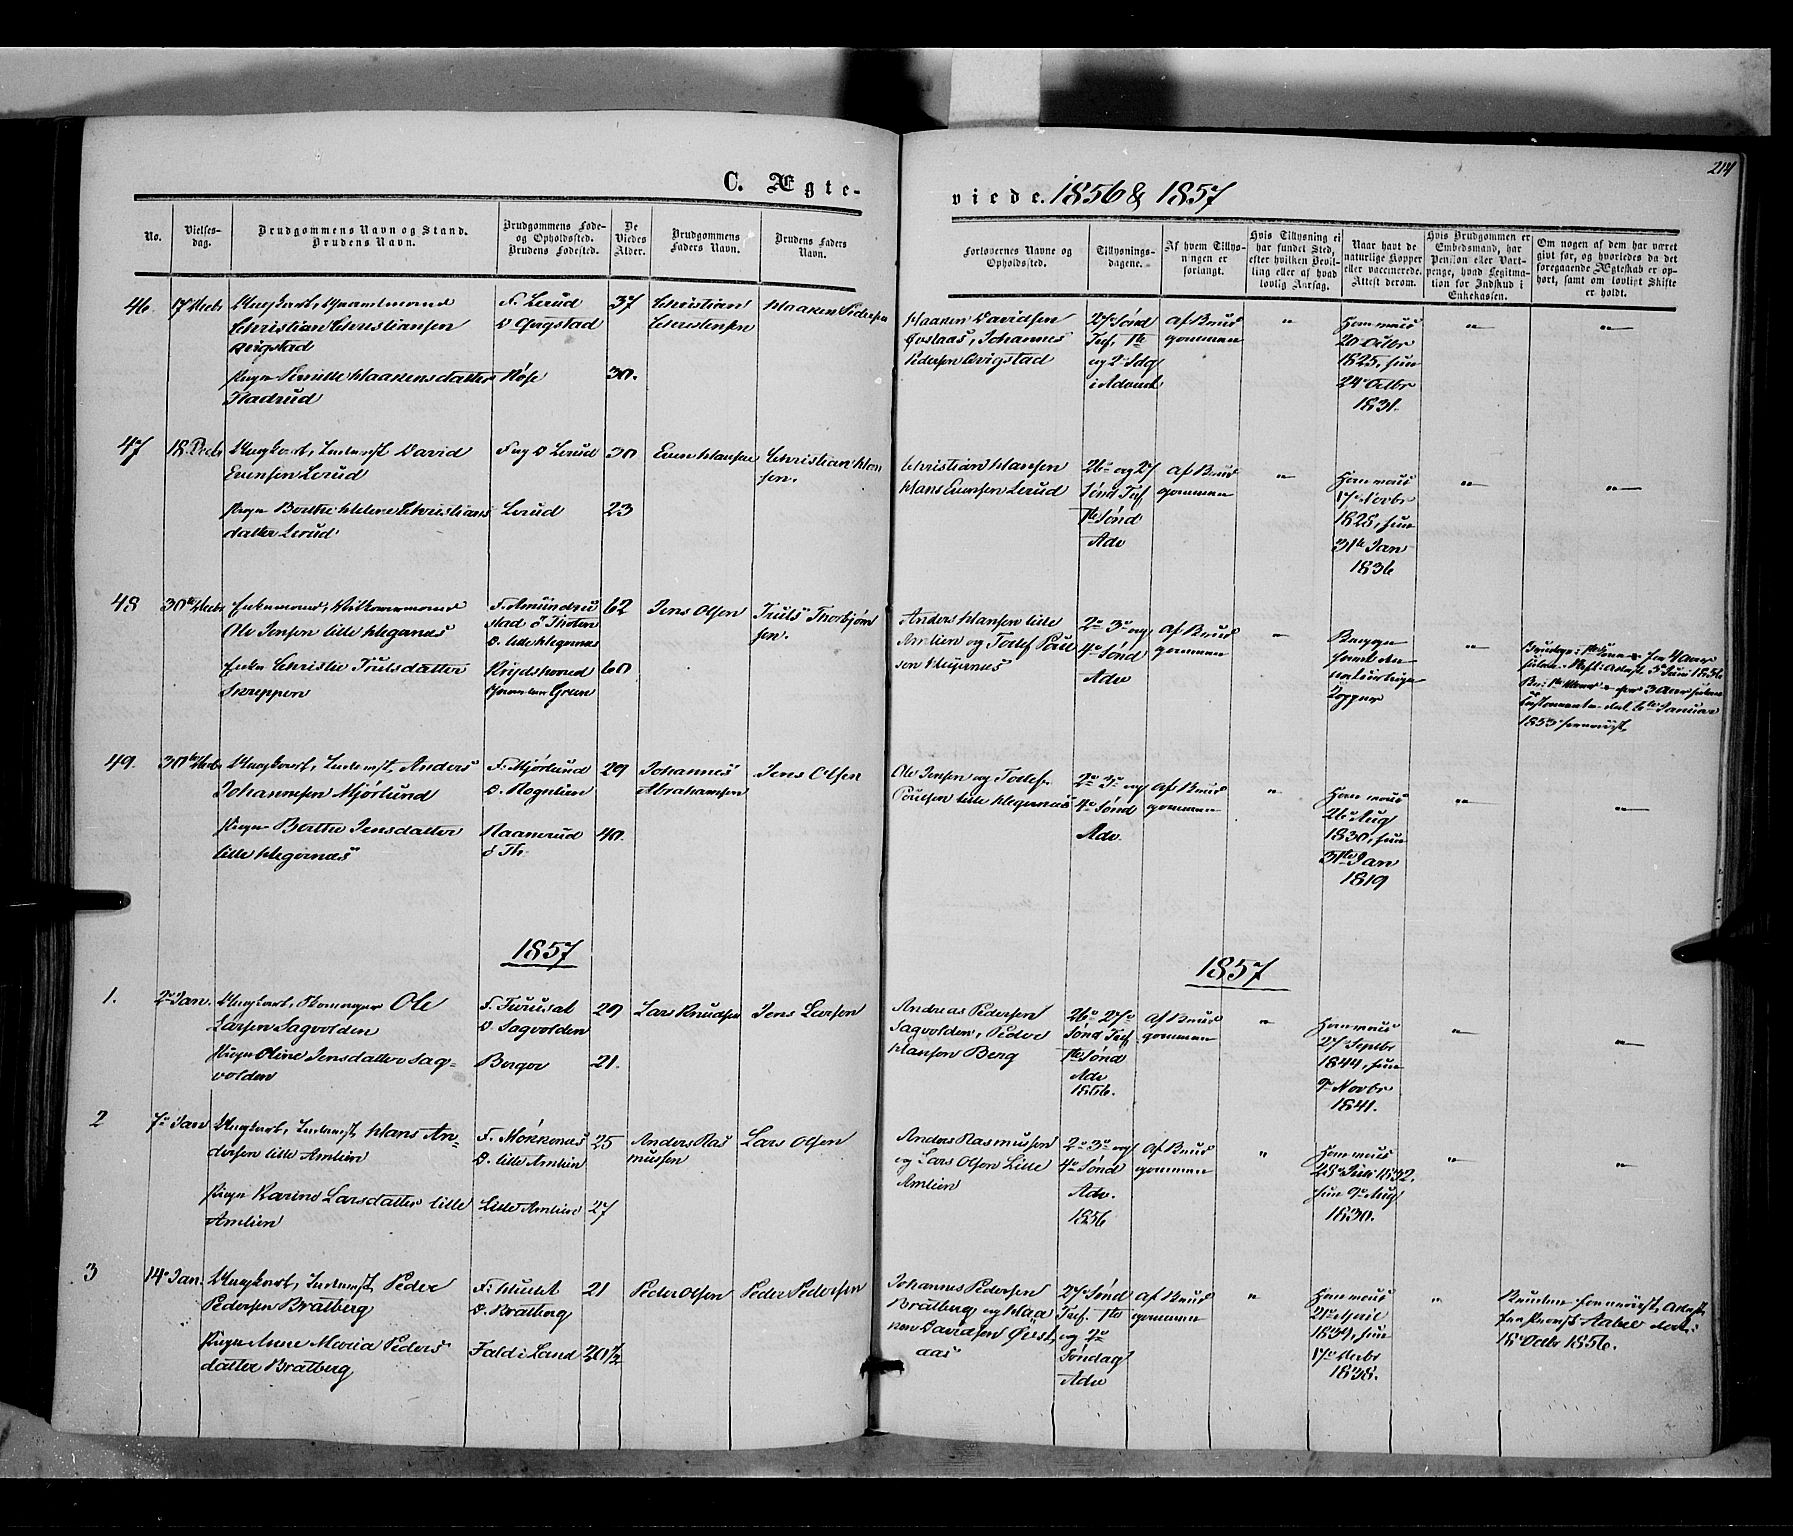 SAH, Vestre Toten prestekontor, H/Ha/Haa/L0006: Ministerialbok nr. 6, 1856-1861, s. 214